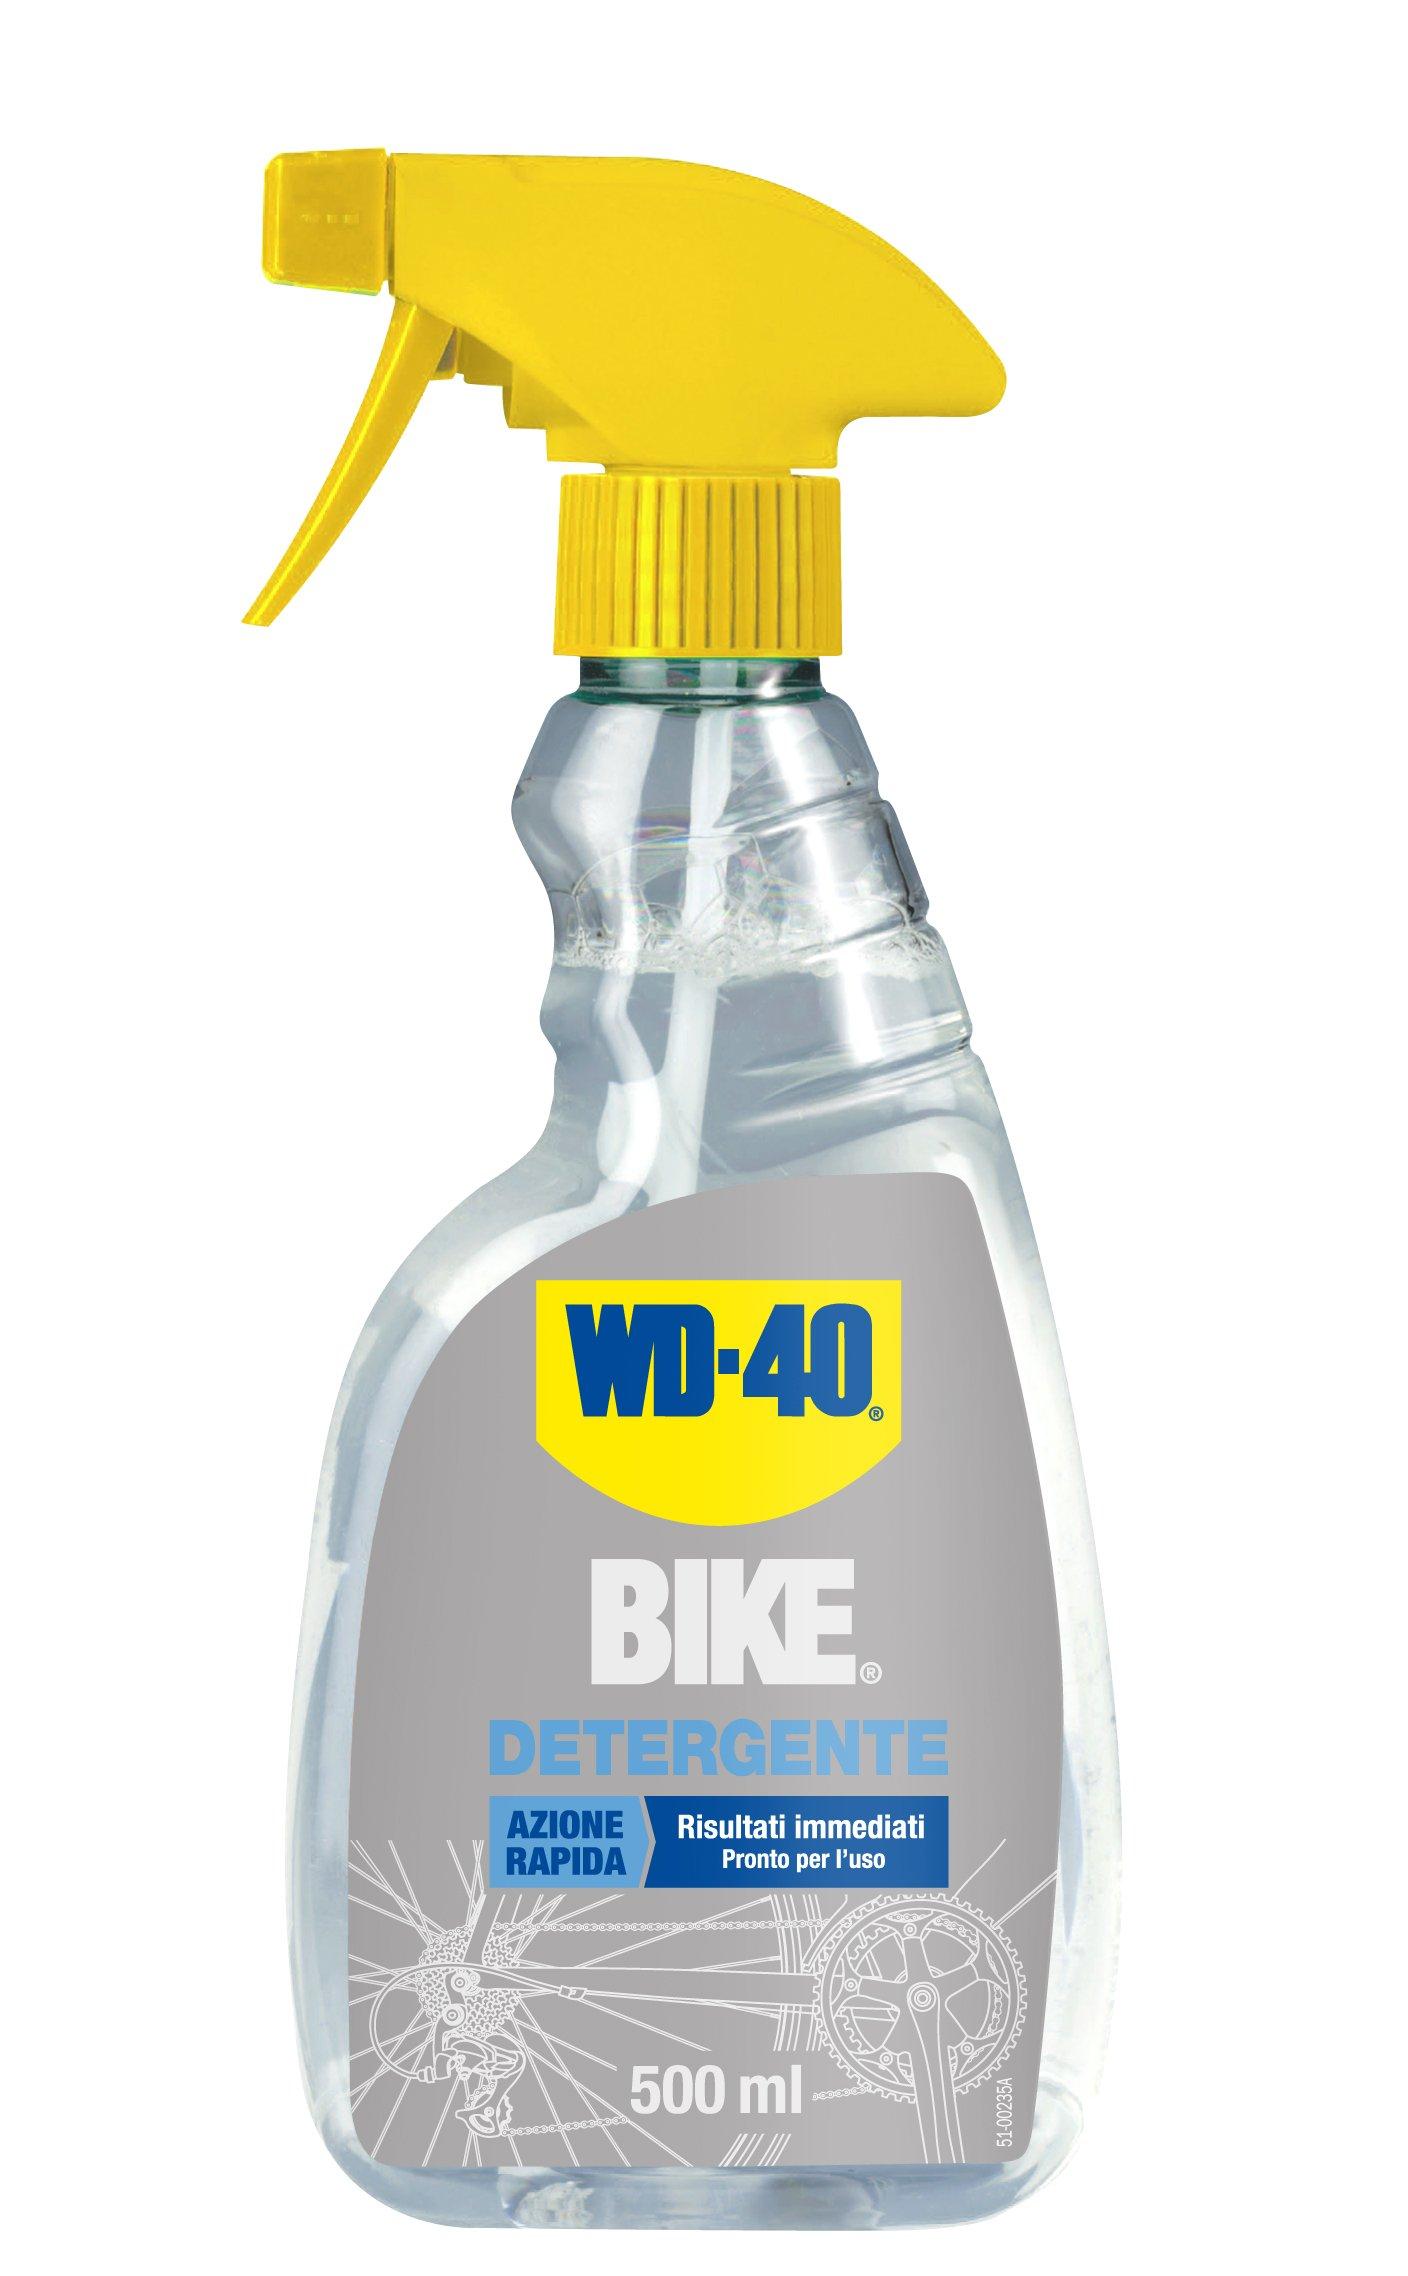 WD-40 Bike – Detergente Bici Spray ad Azione Rapida – 500 ml